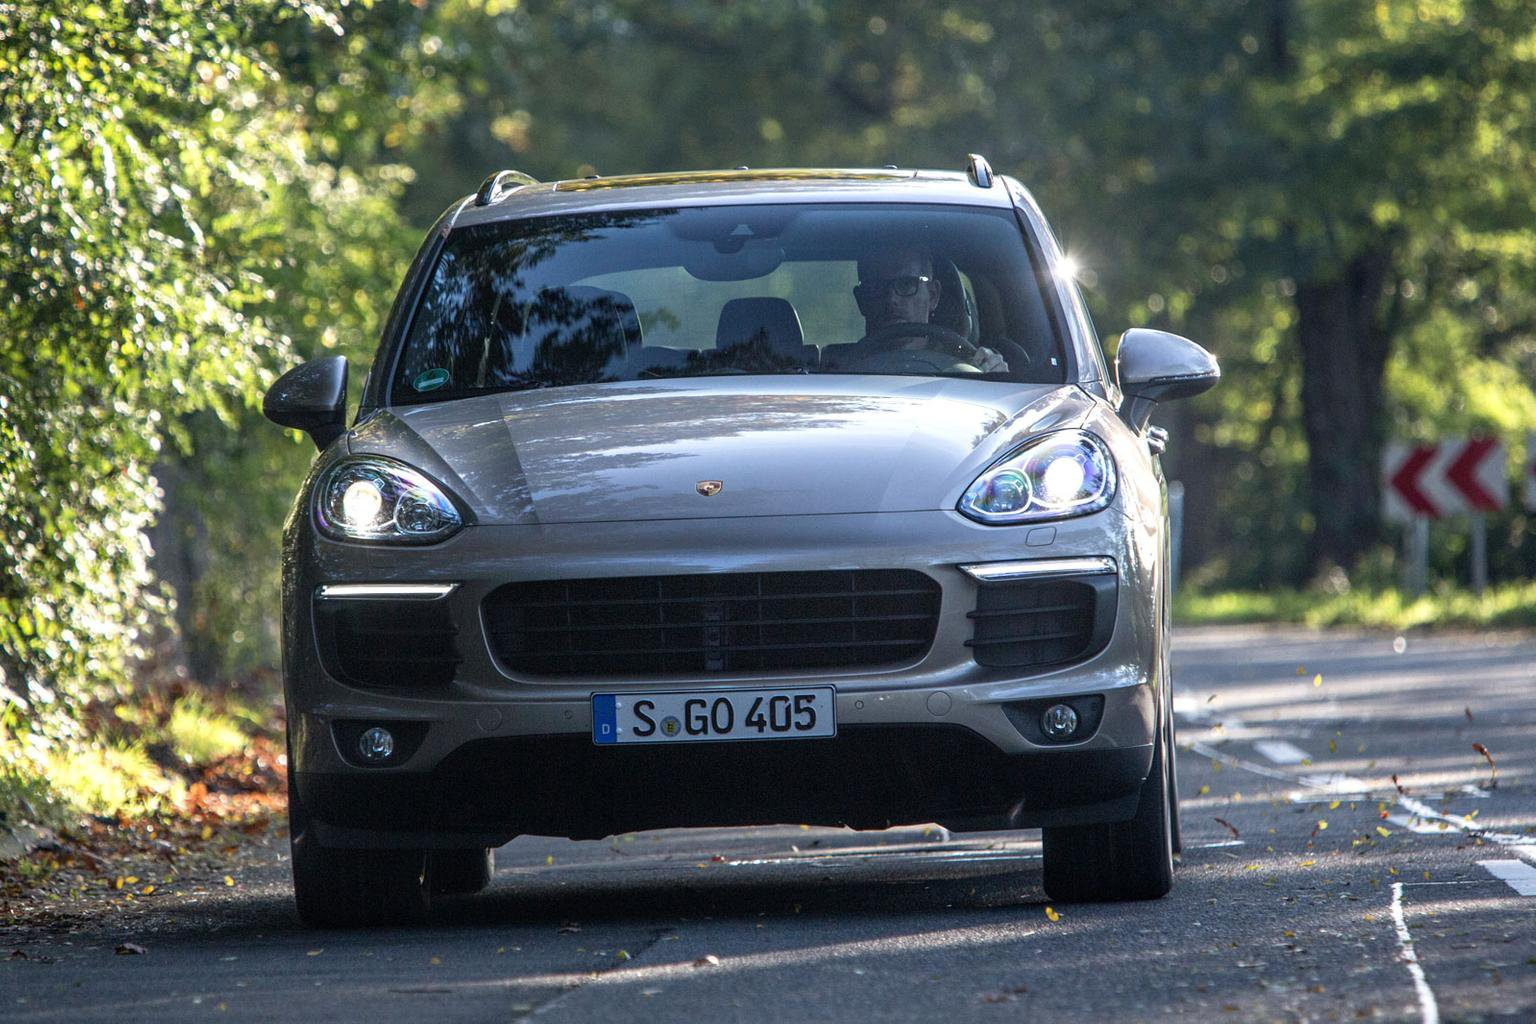 2015 Porsche Cayenne S E-Hybrid review